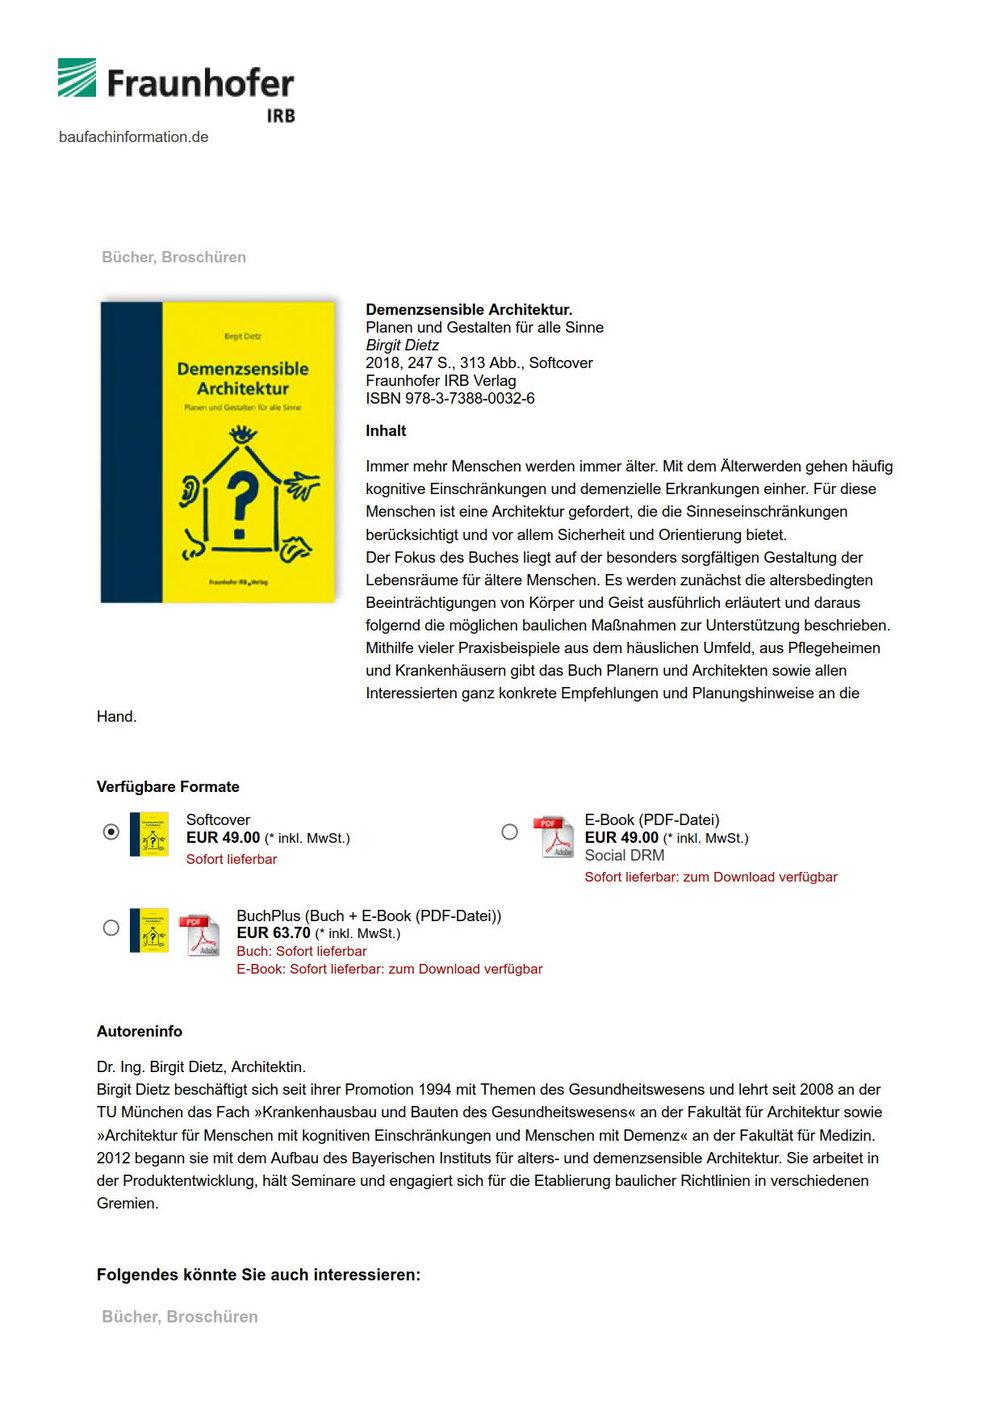 Buch Fraunhofer Website.jpg